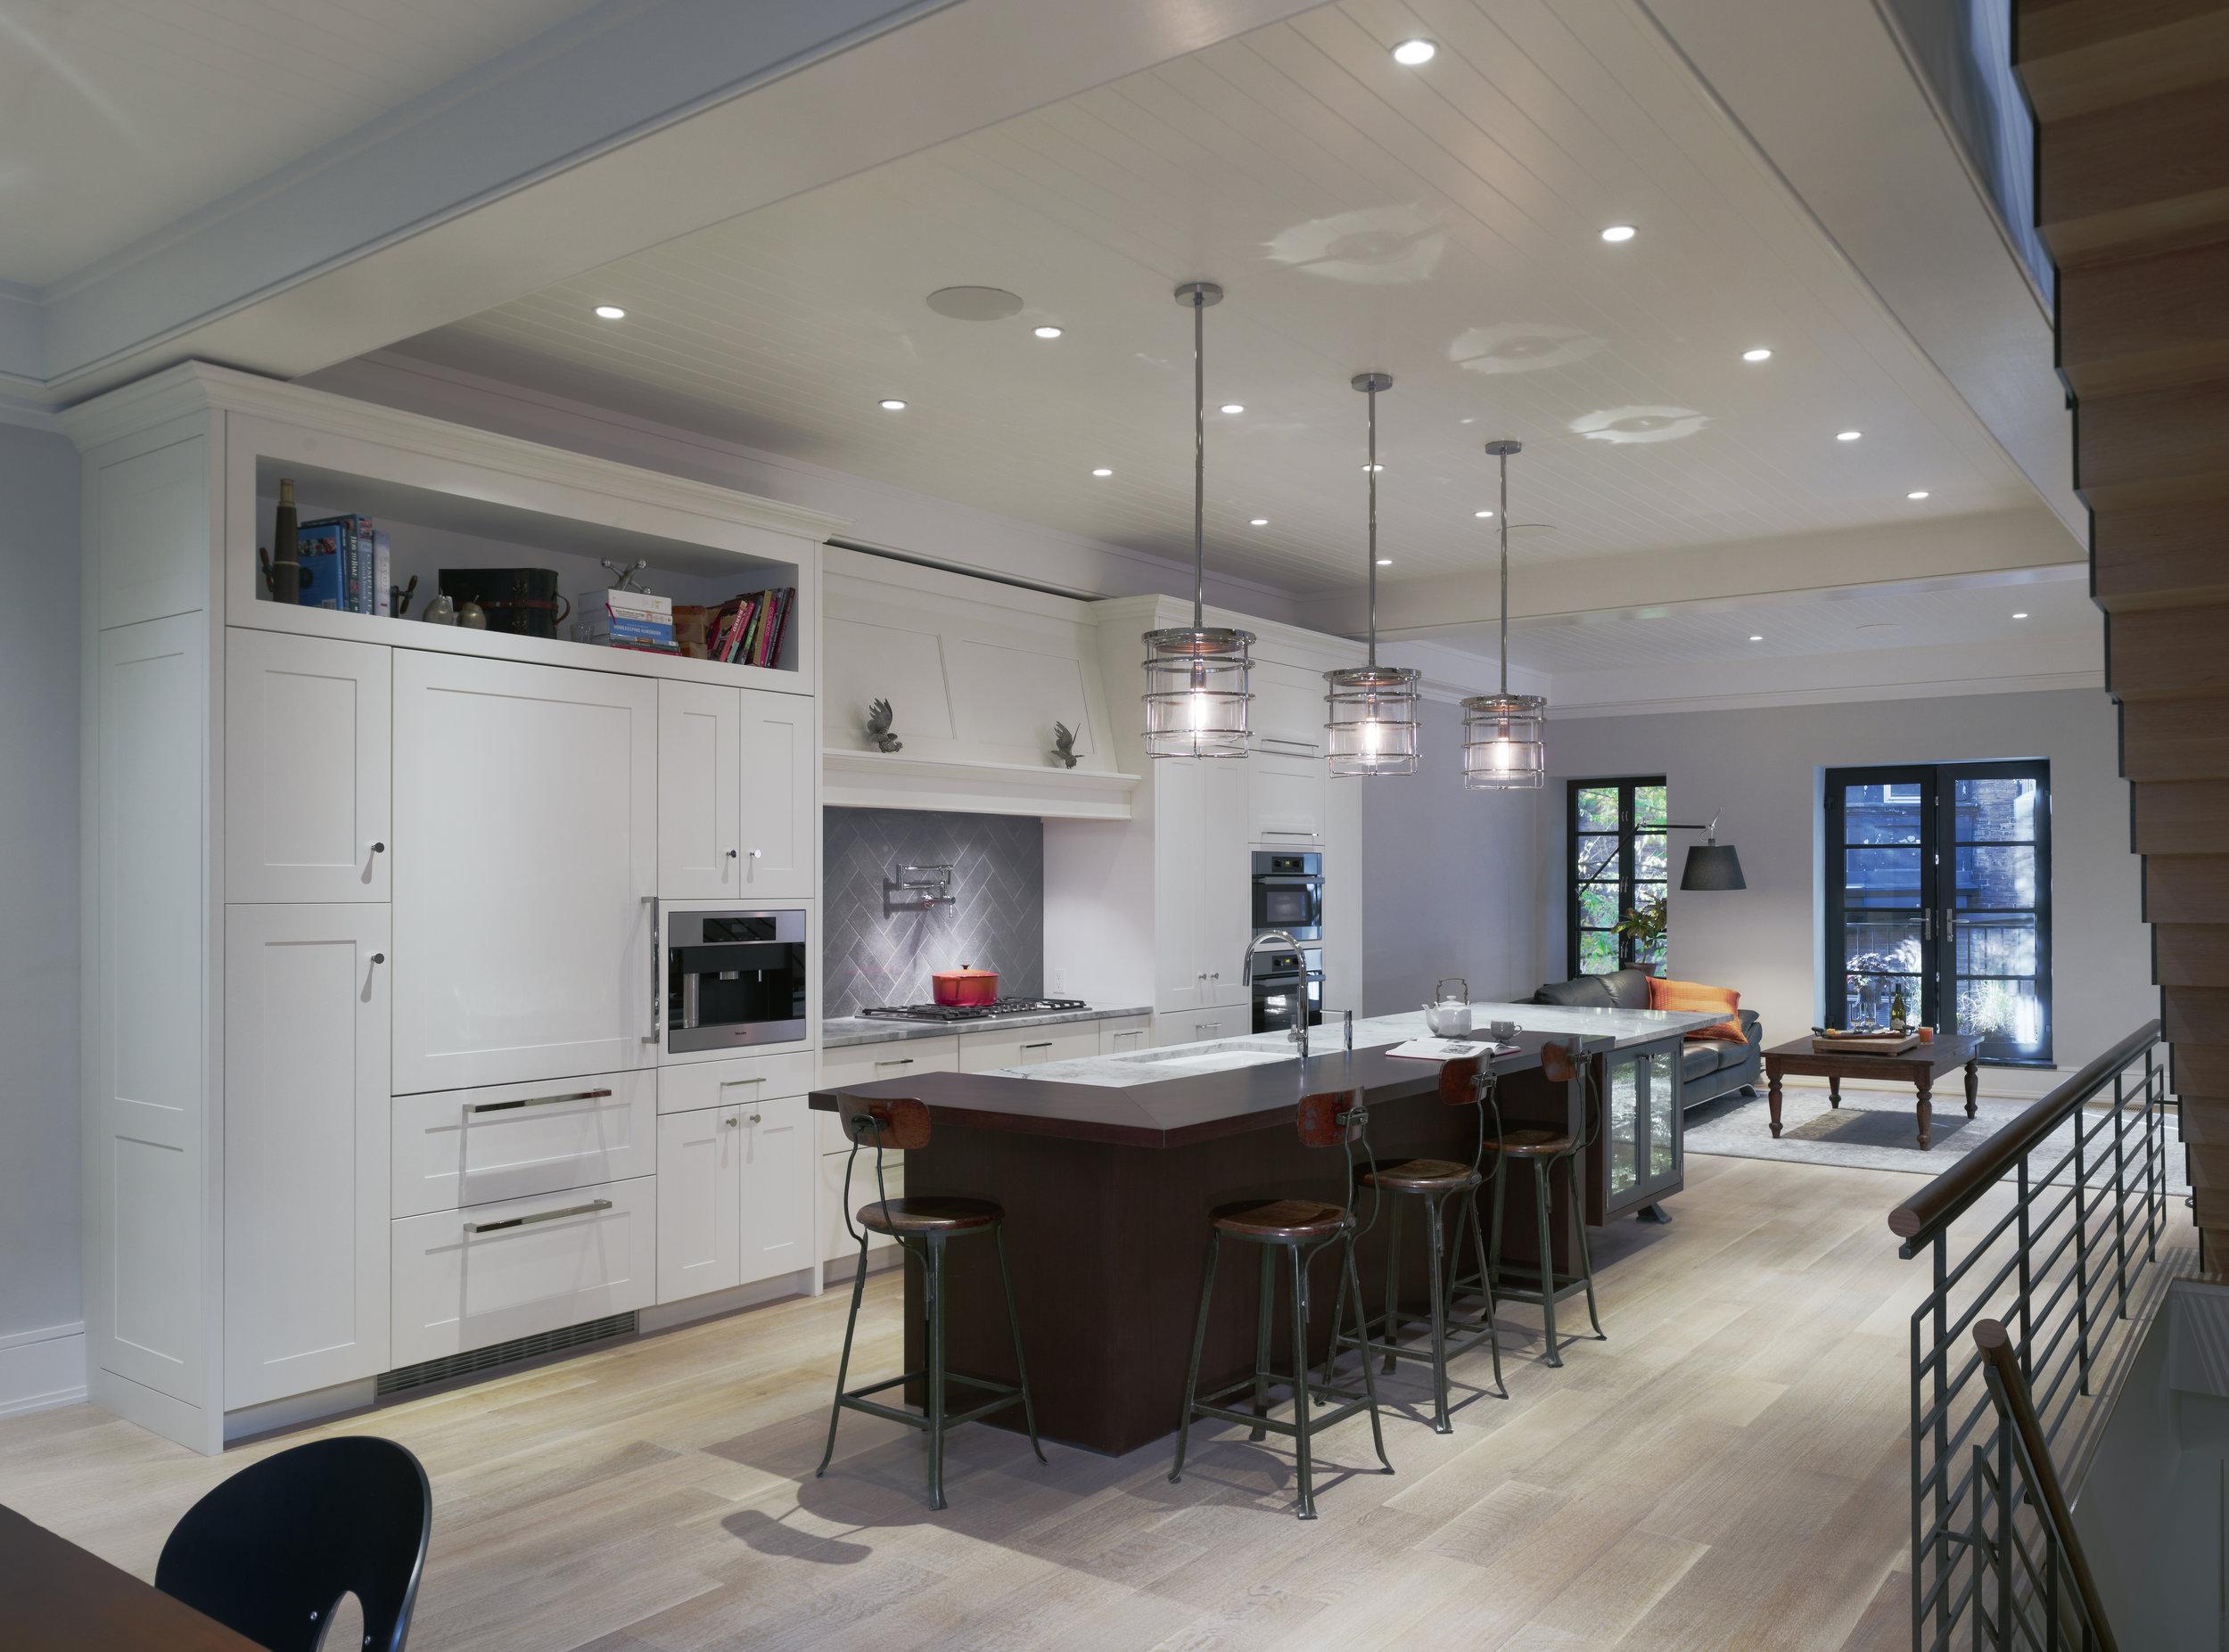 LF Kitchen 2a (from Jthom 2).jpg